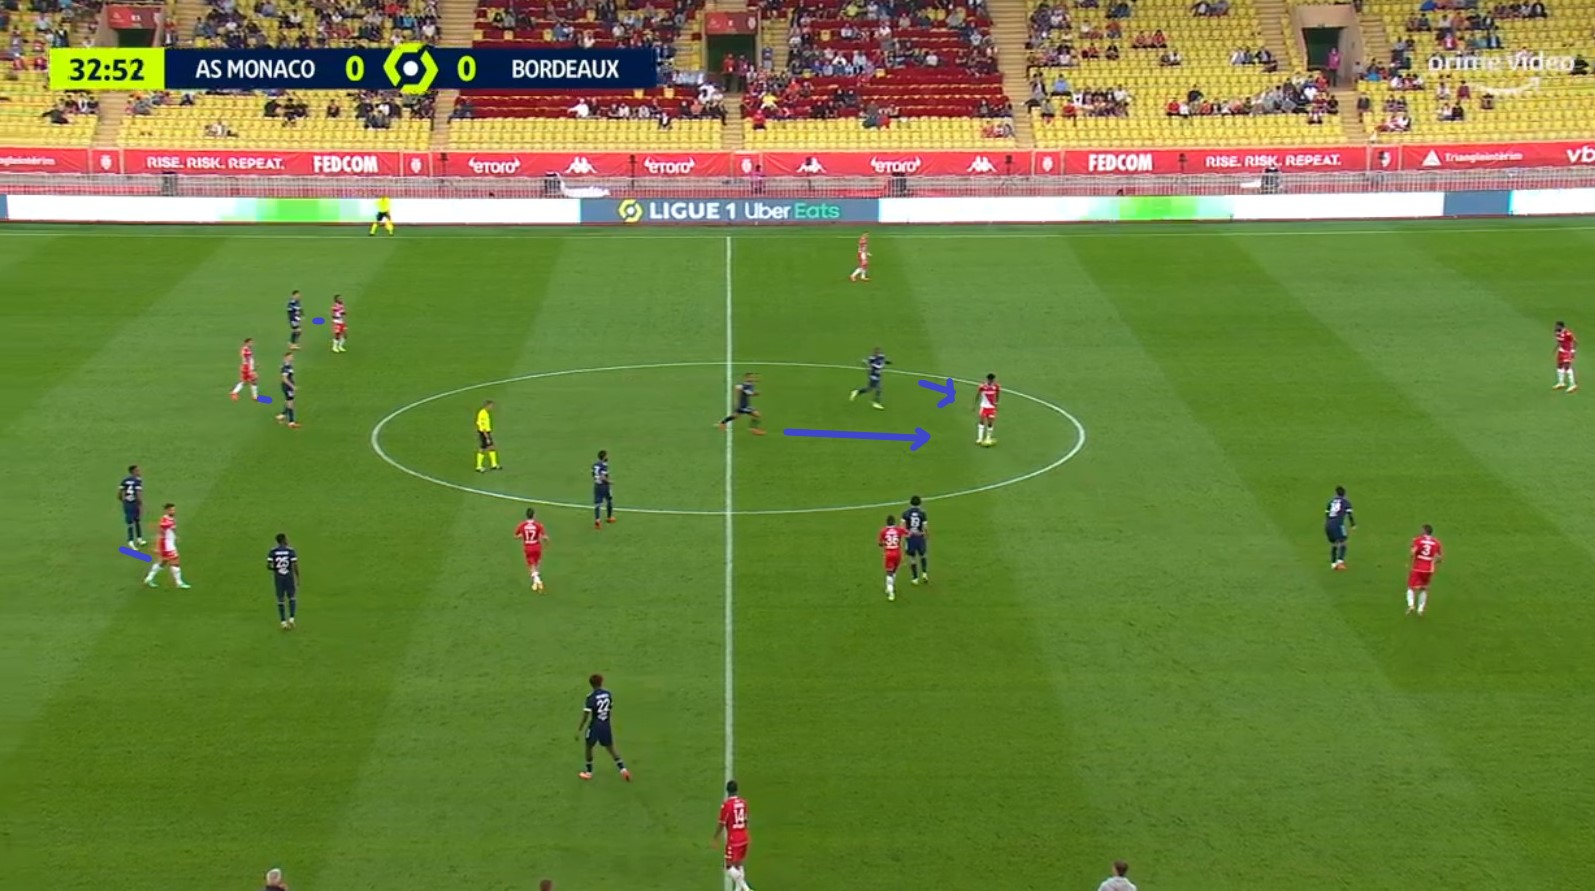 Monaco2_2.jpg (264 KB)